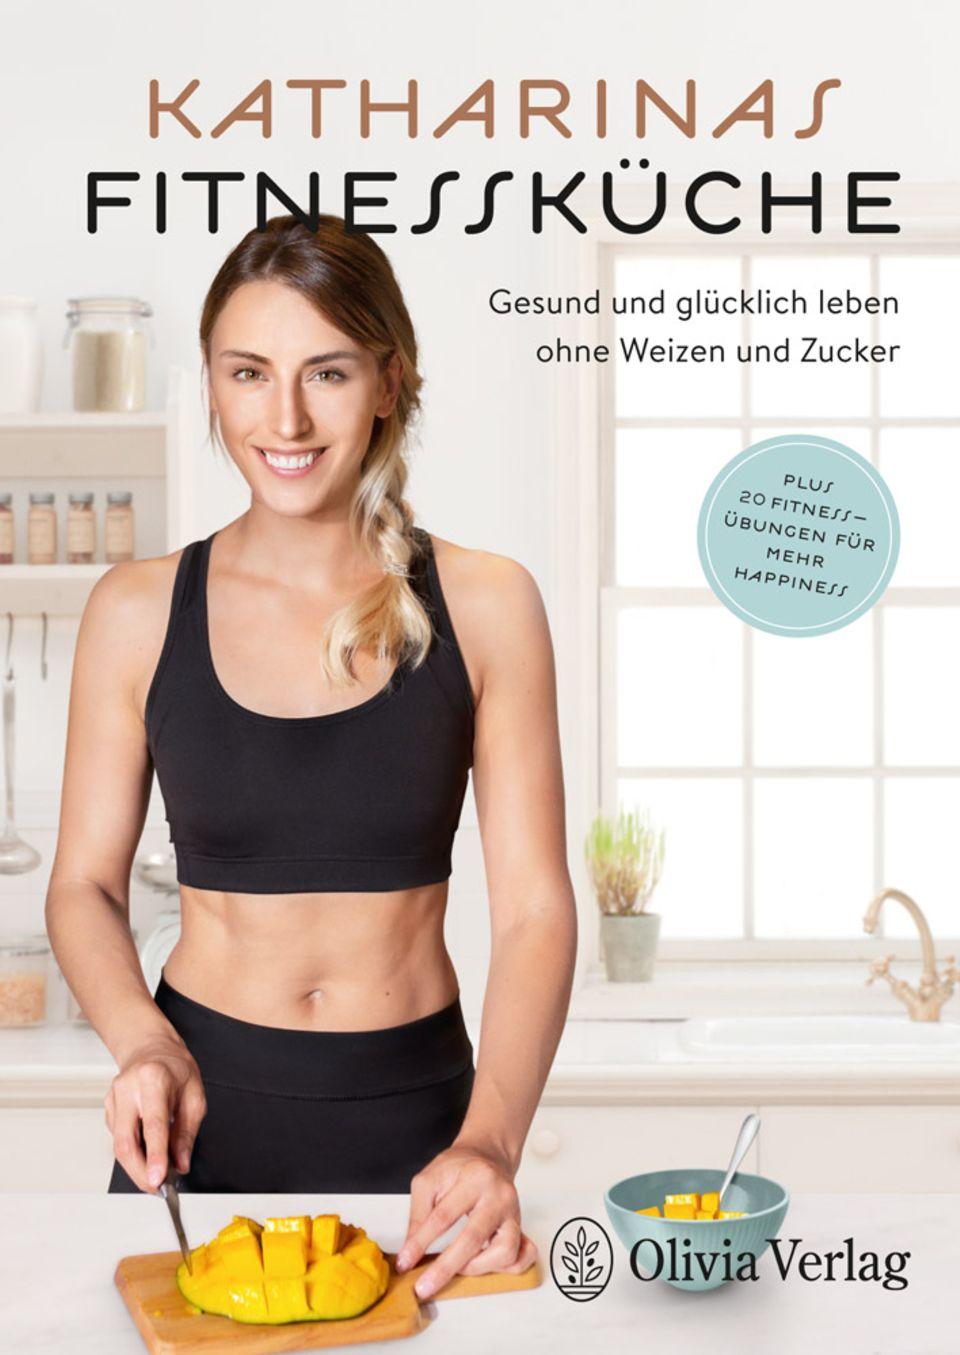 Katharinas Fitnessküche Cover